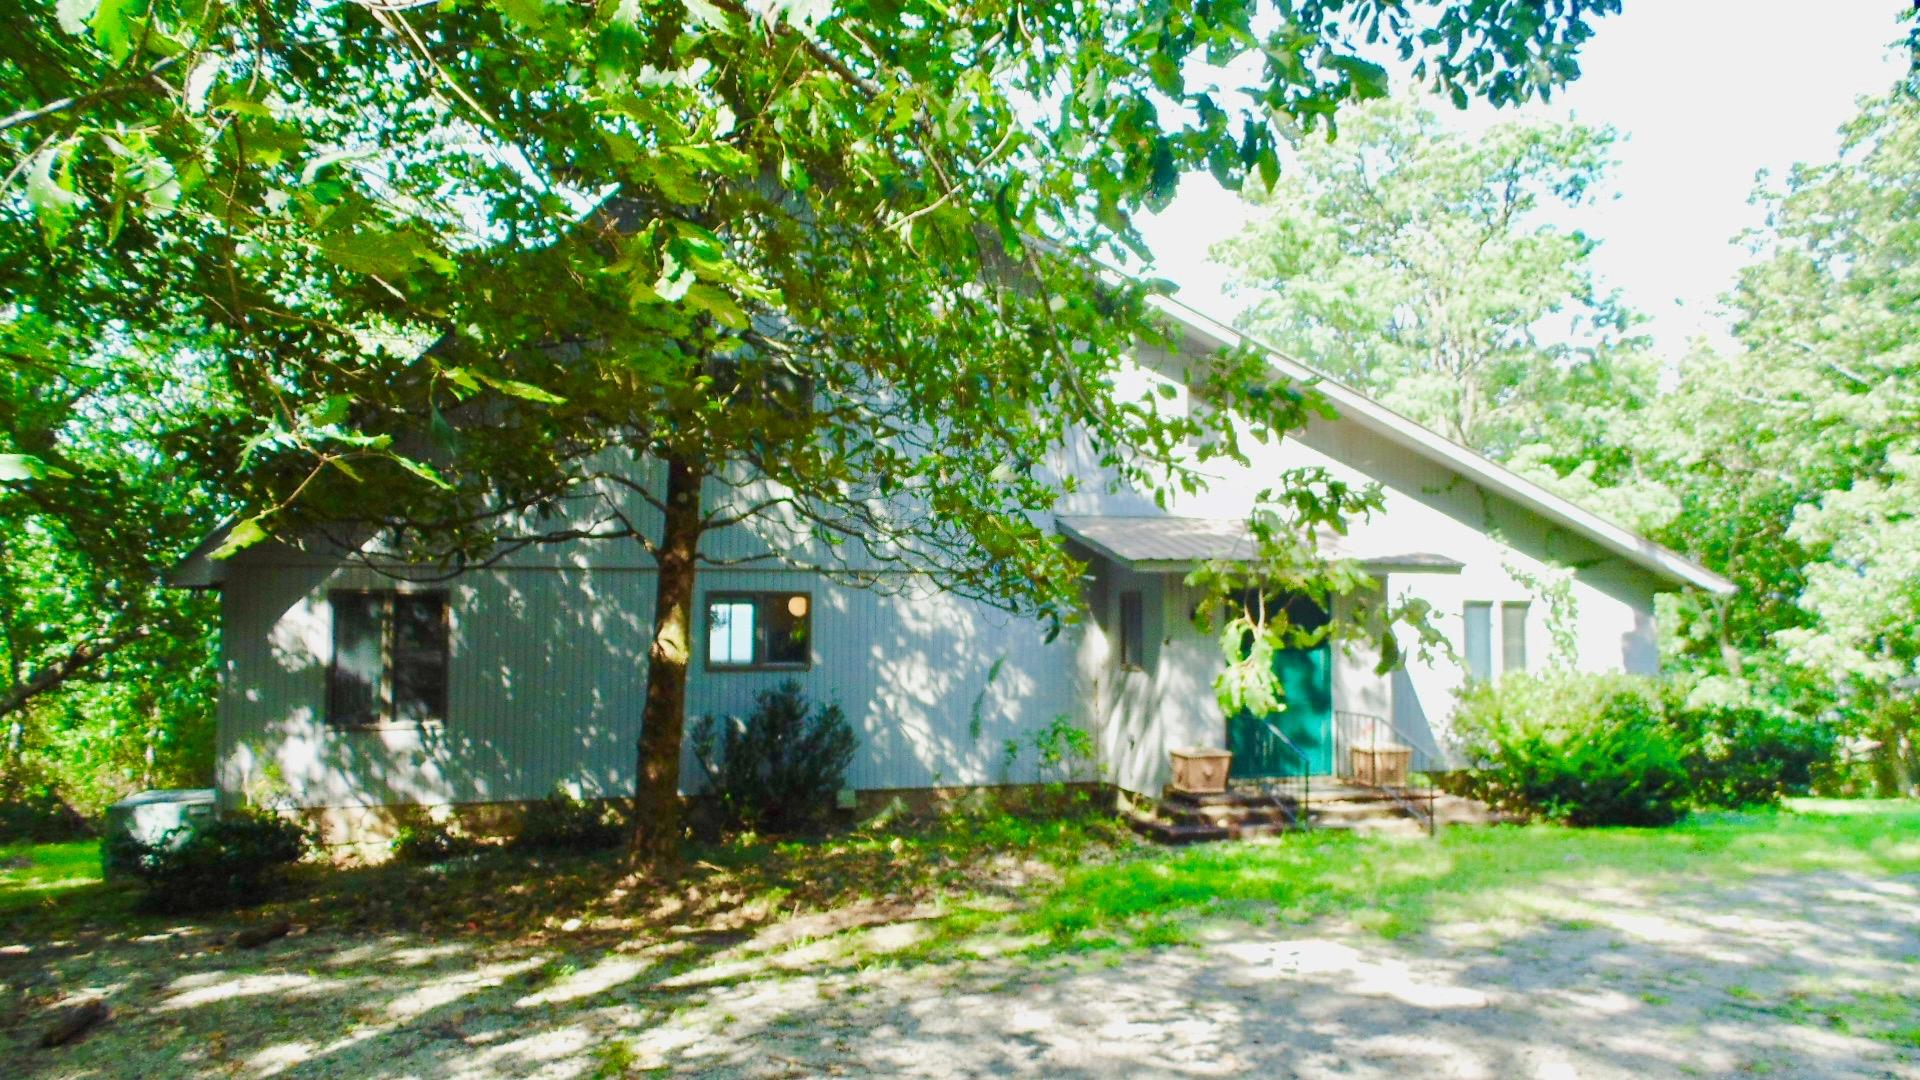 733 Montvue Dr, Sewanee, TN 37375 - Sewanee, TN real estate listing